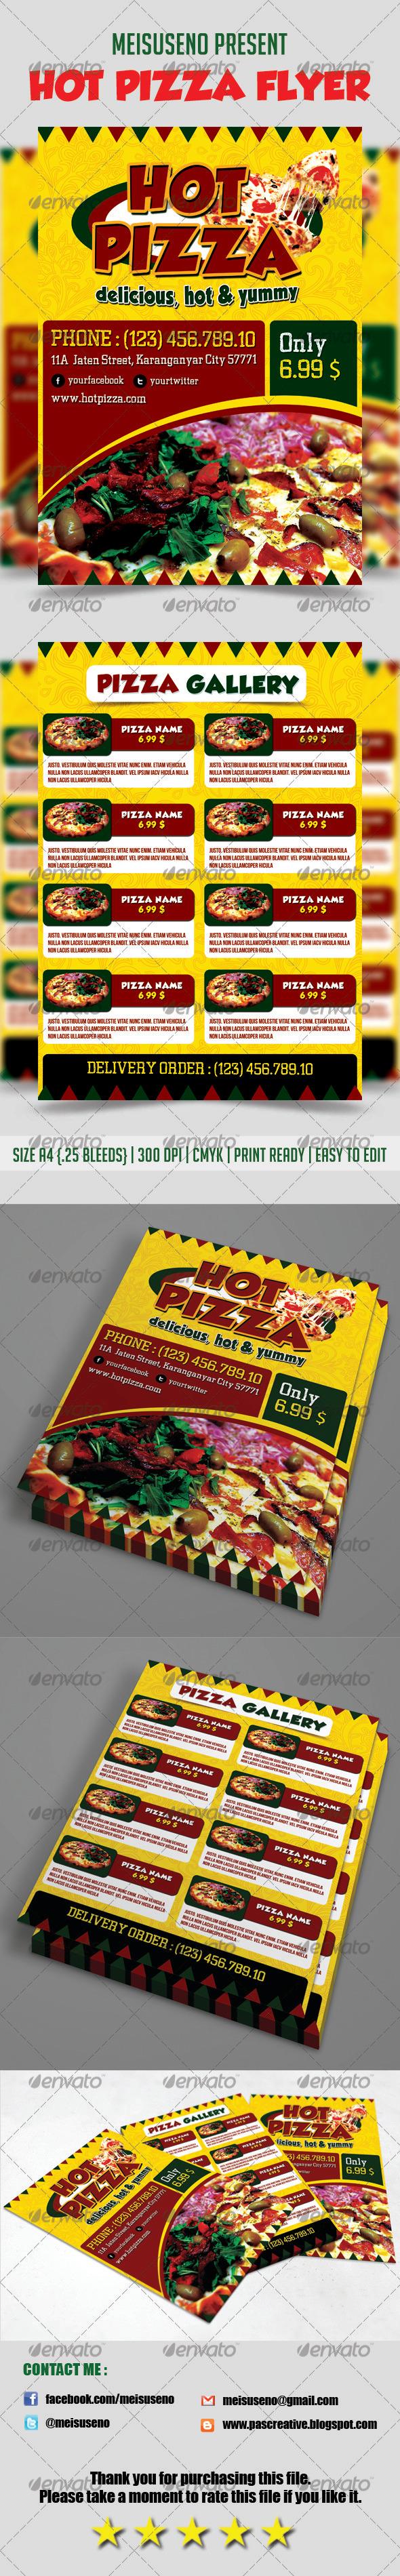 Hot Pizza Flyer Template - Restaurant Flyers